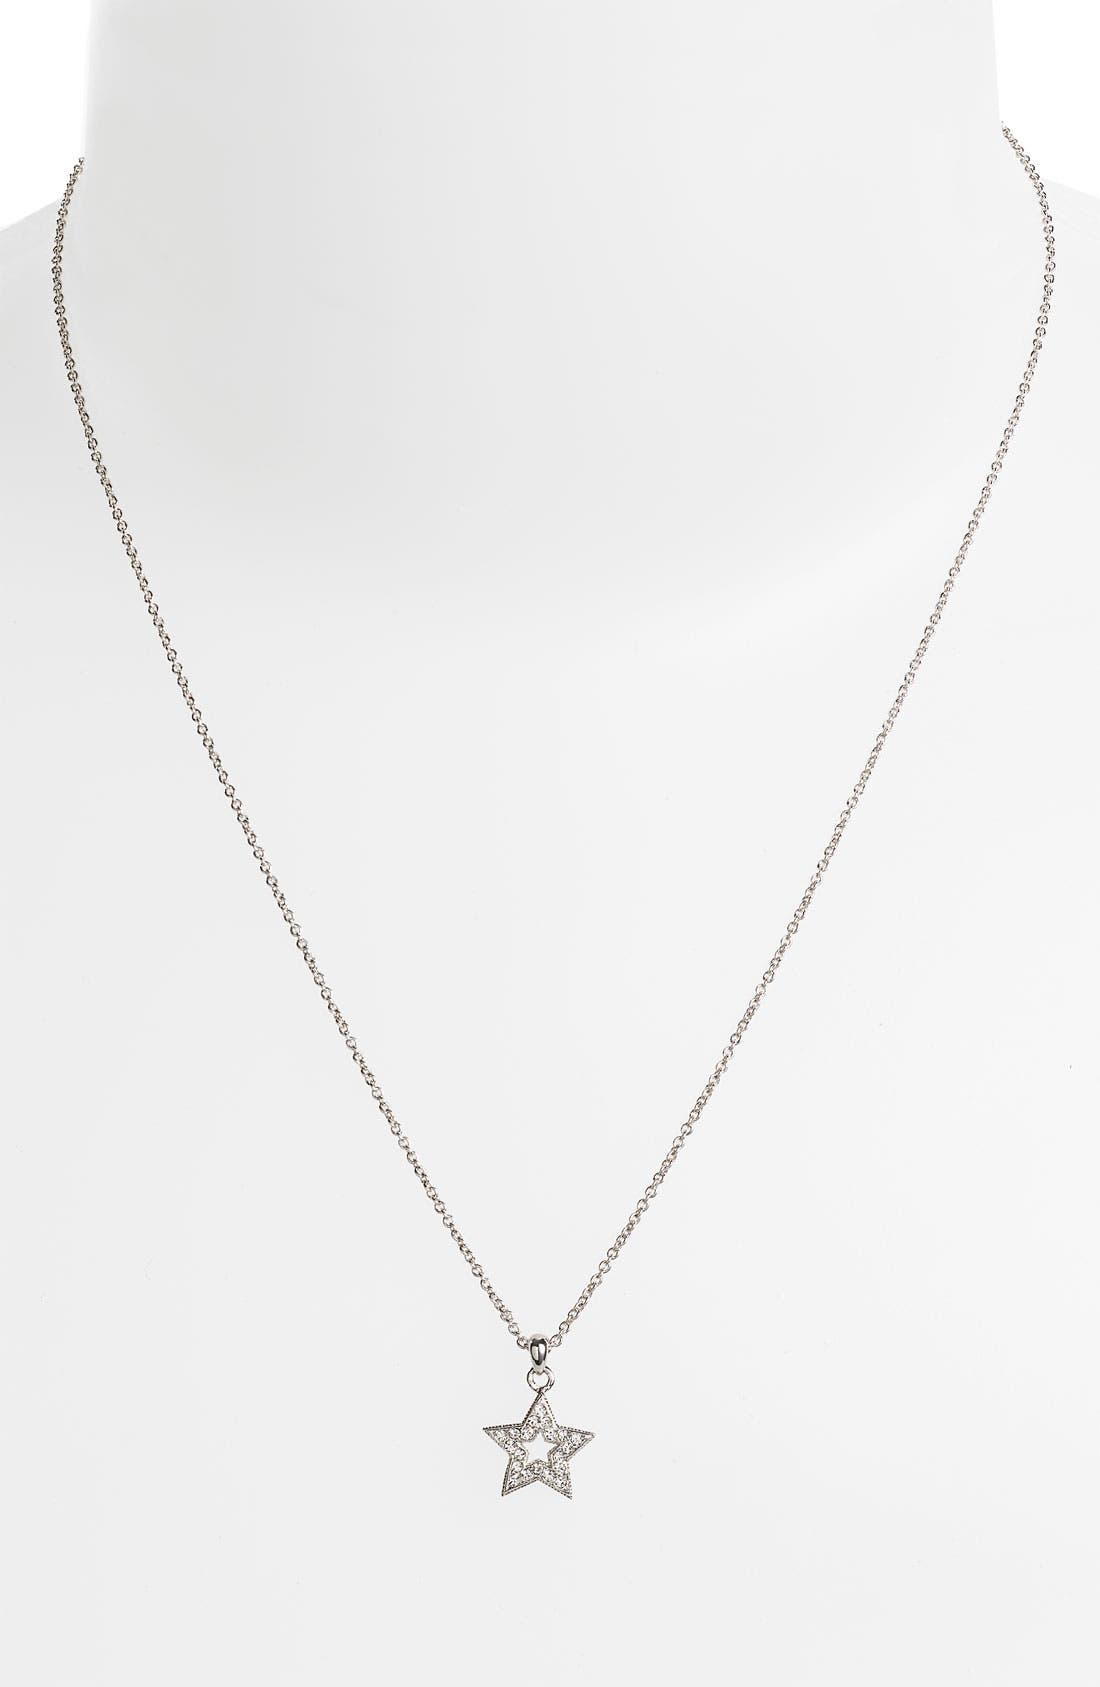 NADRI, Small Star Pendant Boxed Necklace, Main thumbnail 1, color, 040